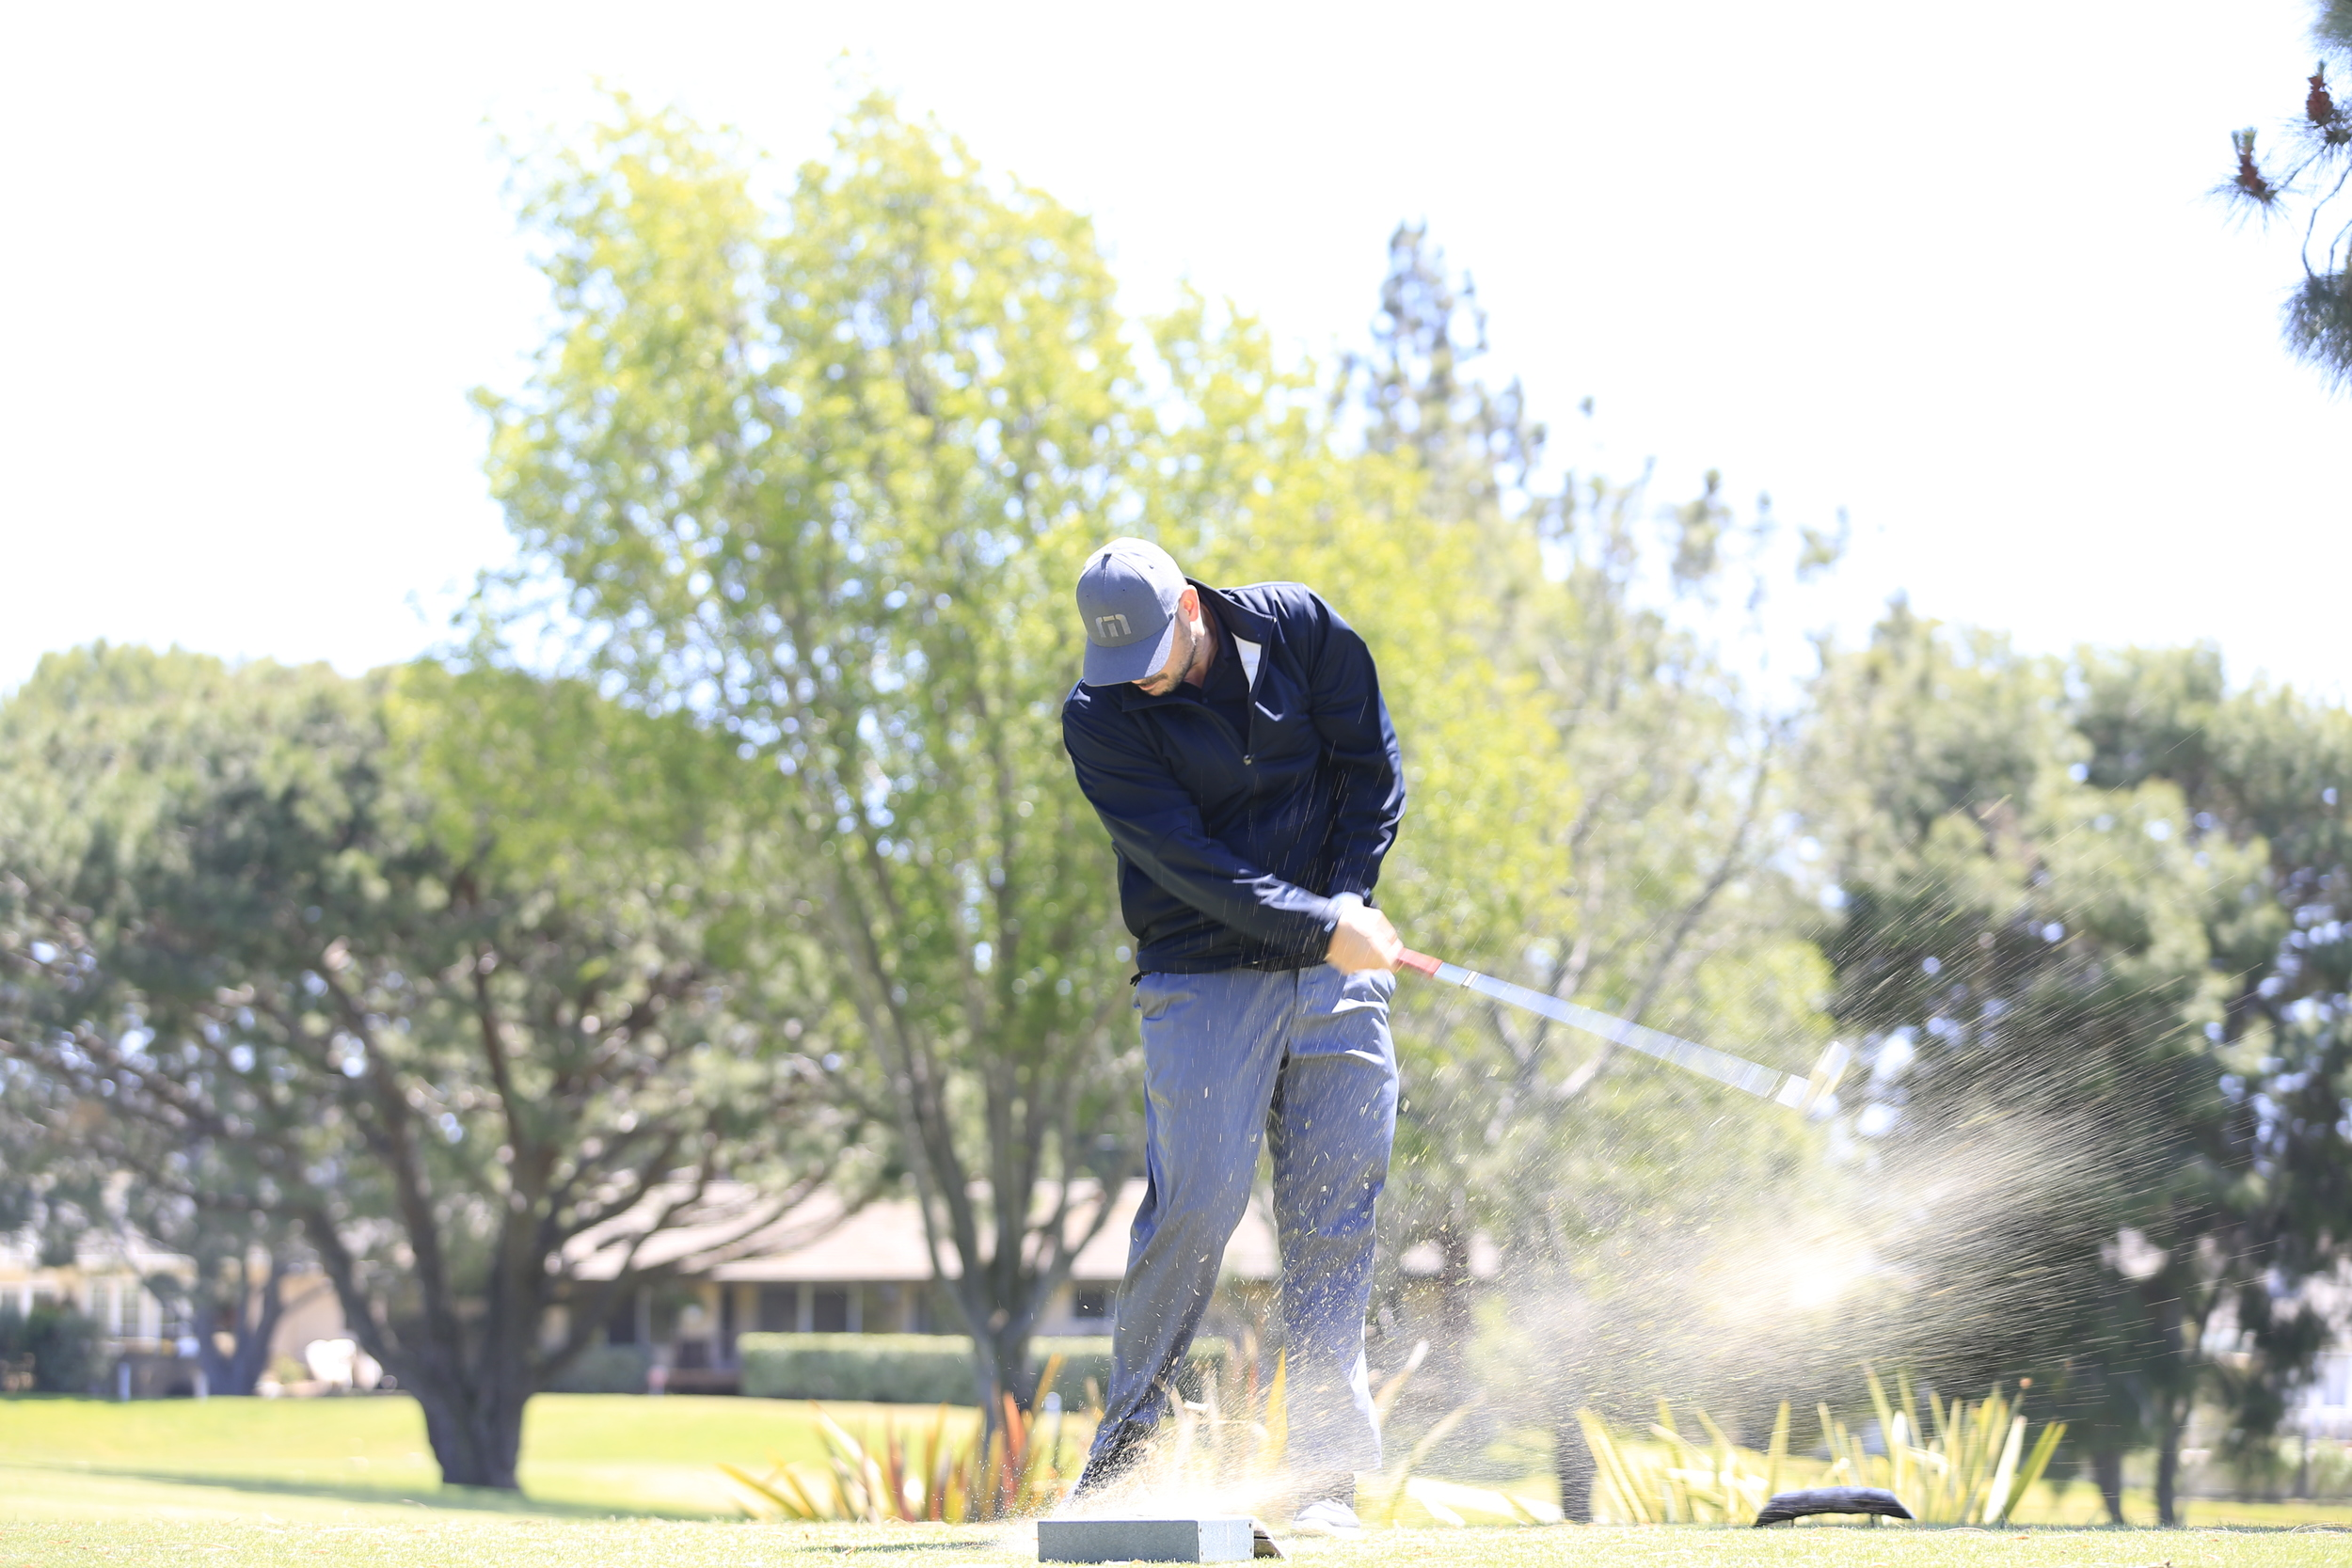 Golfer smacking a ball down range.